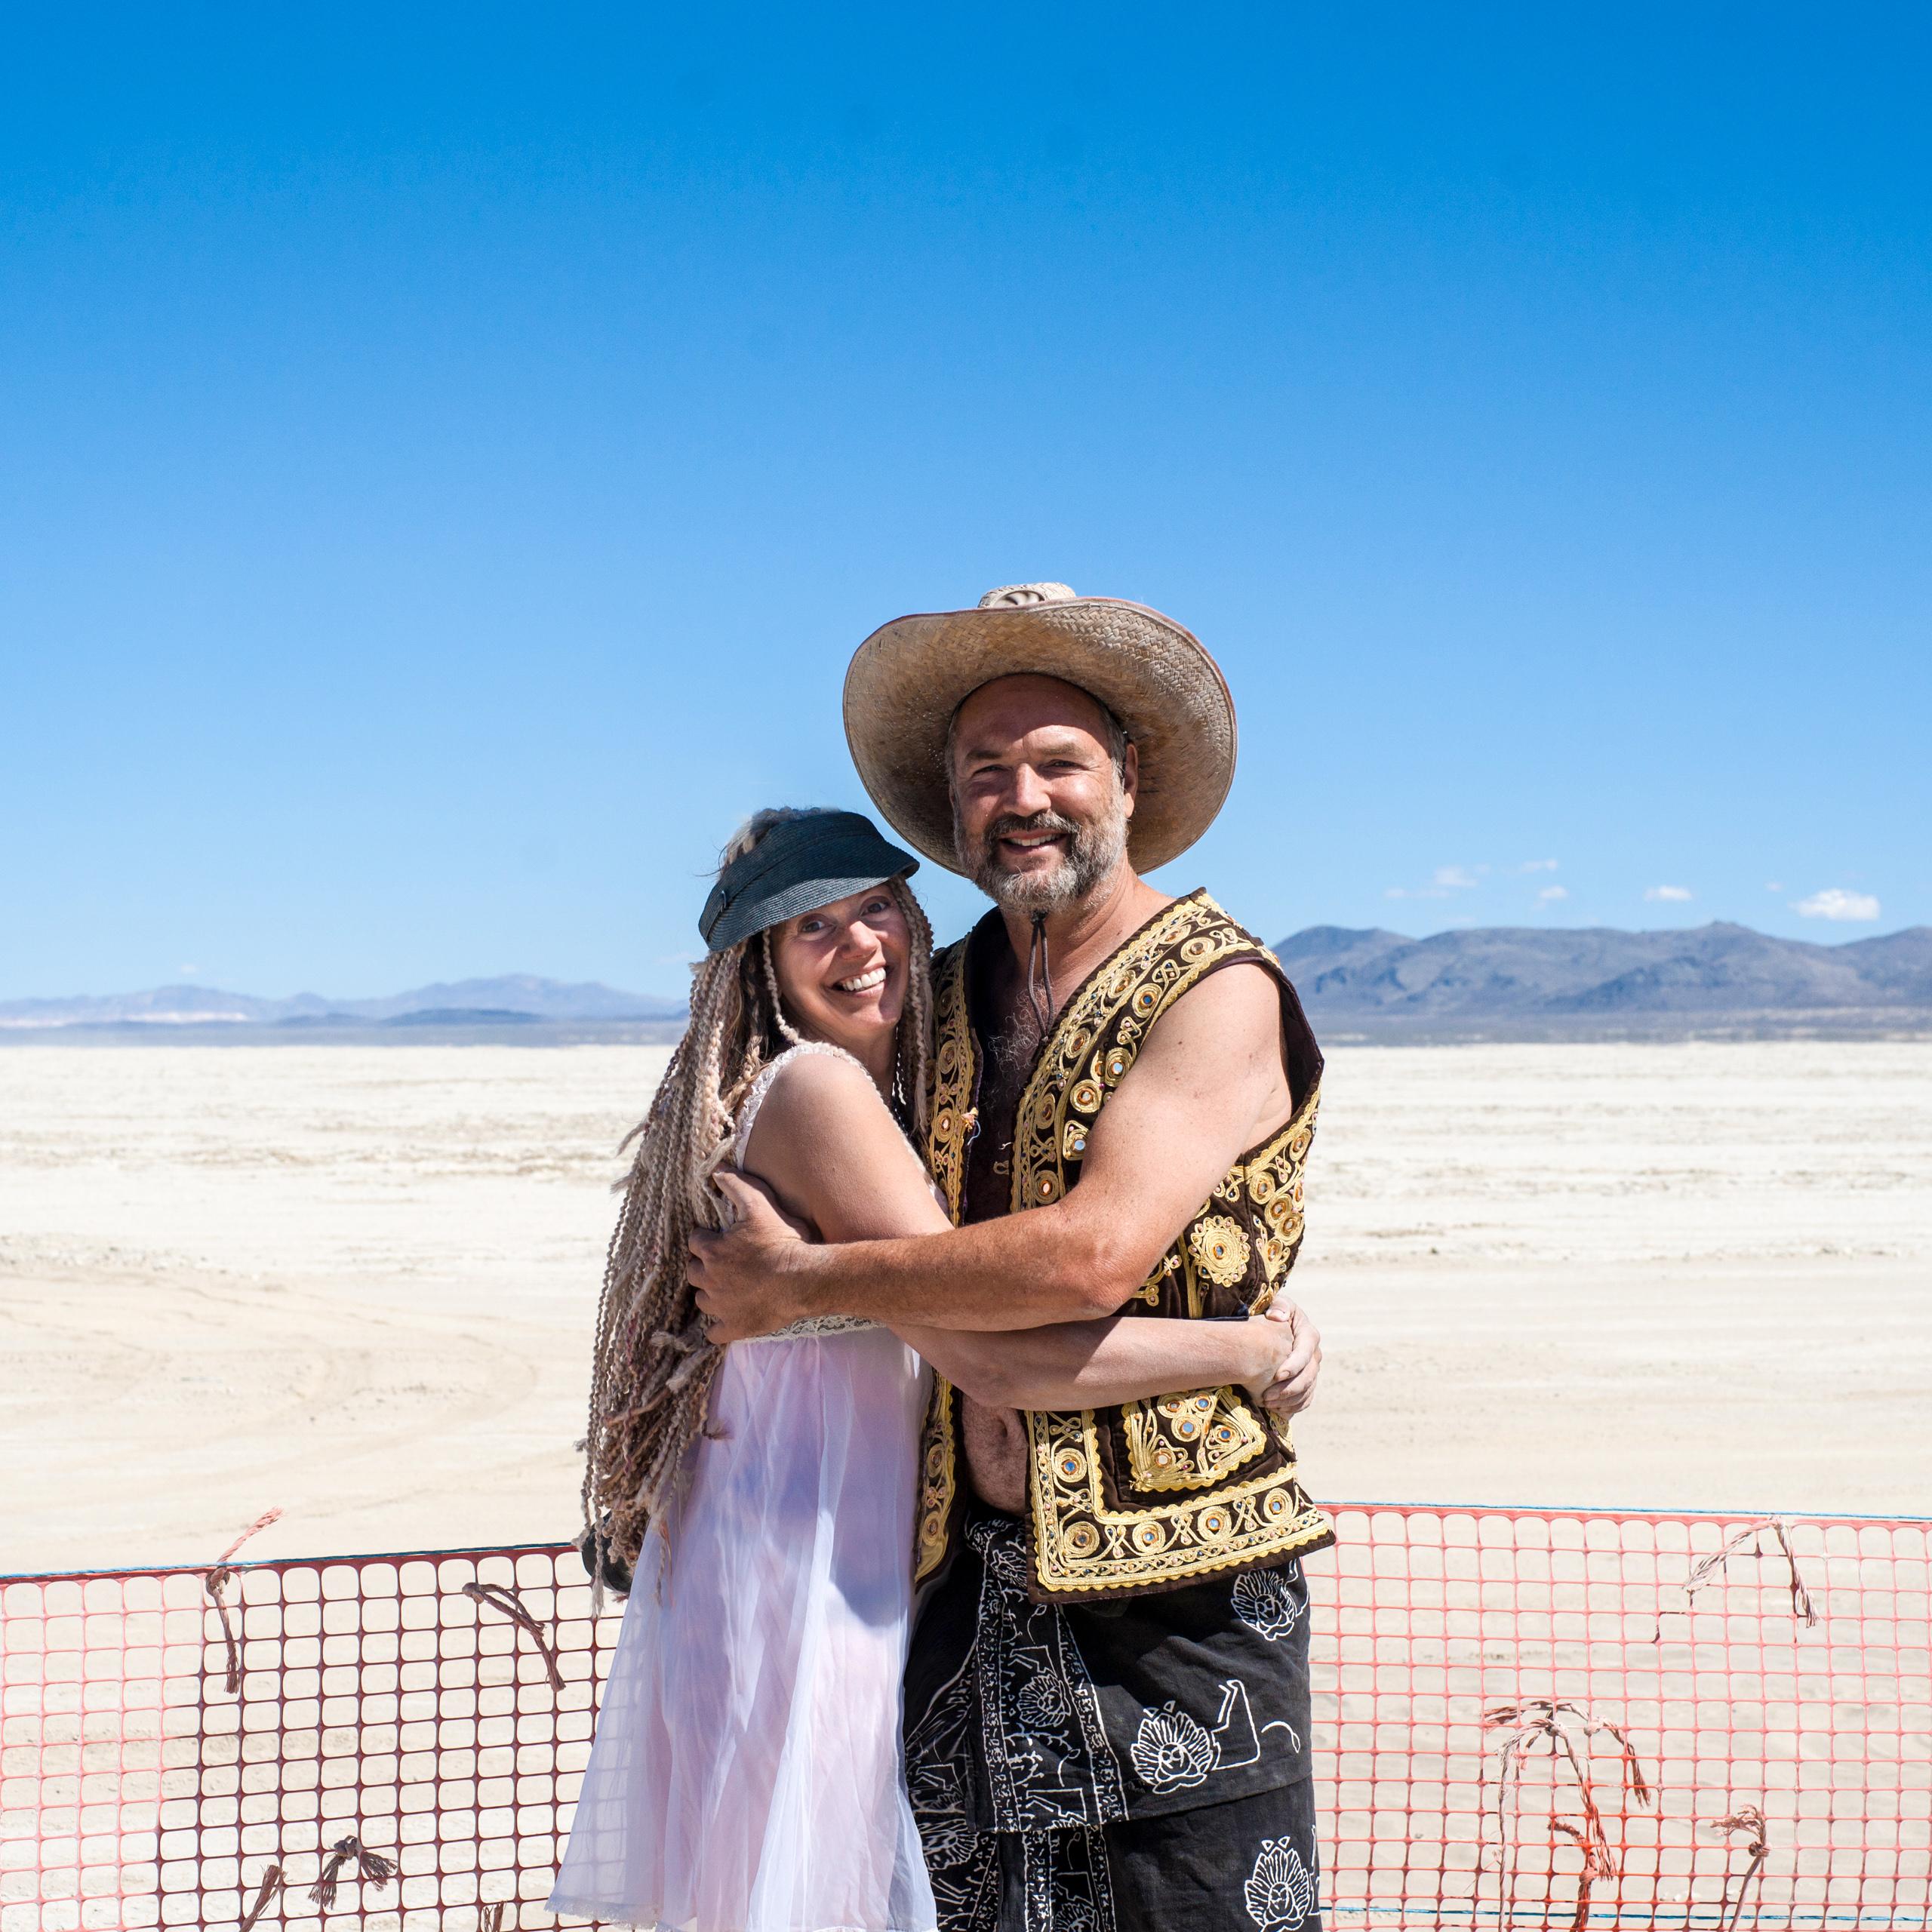 Kathy & Jason